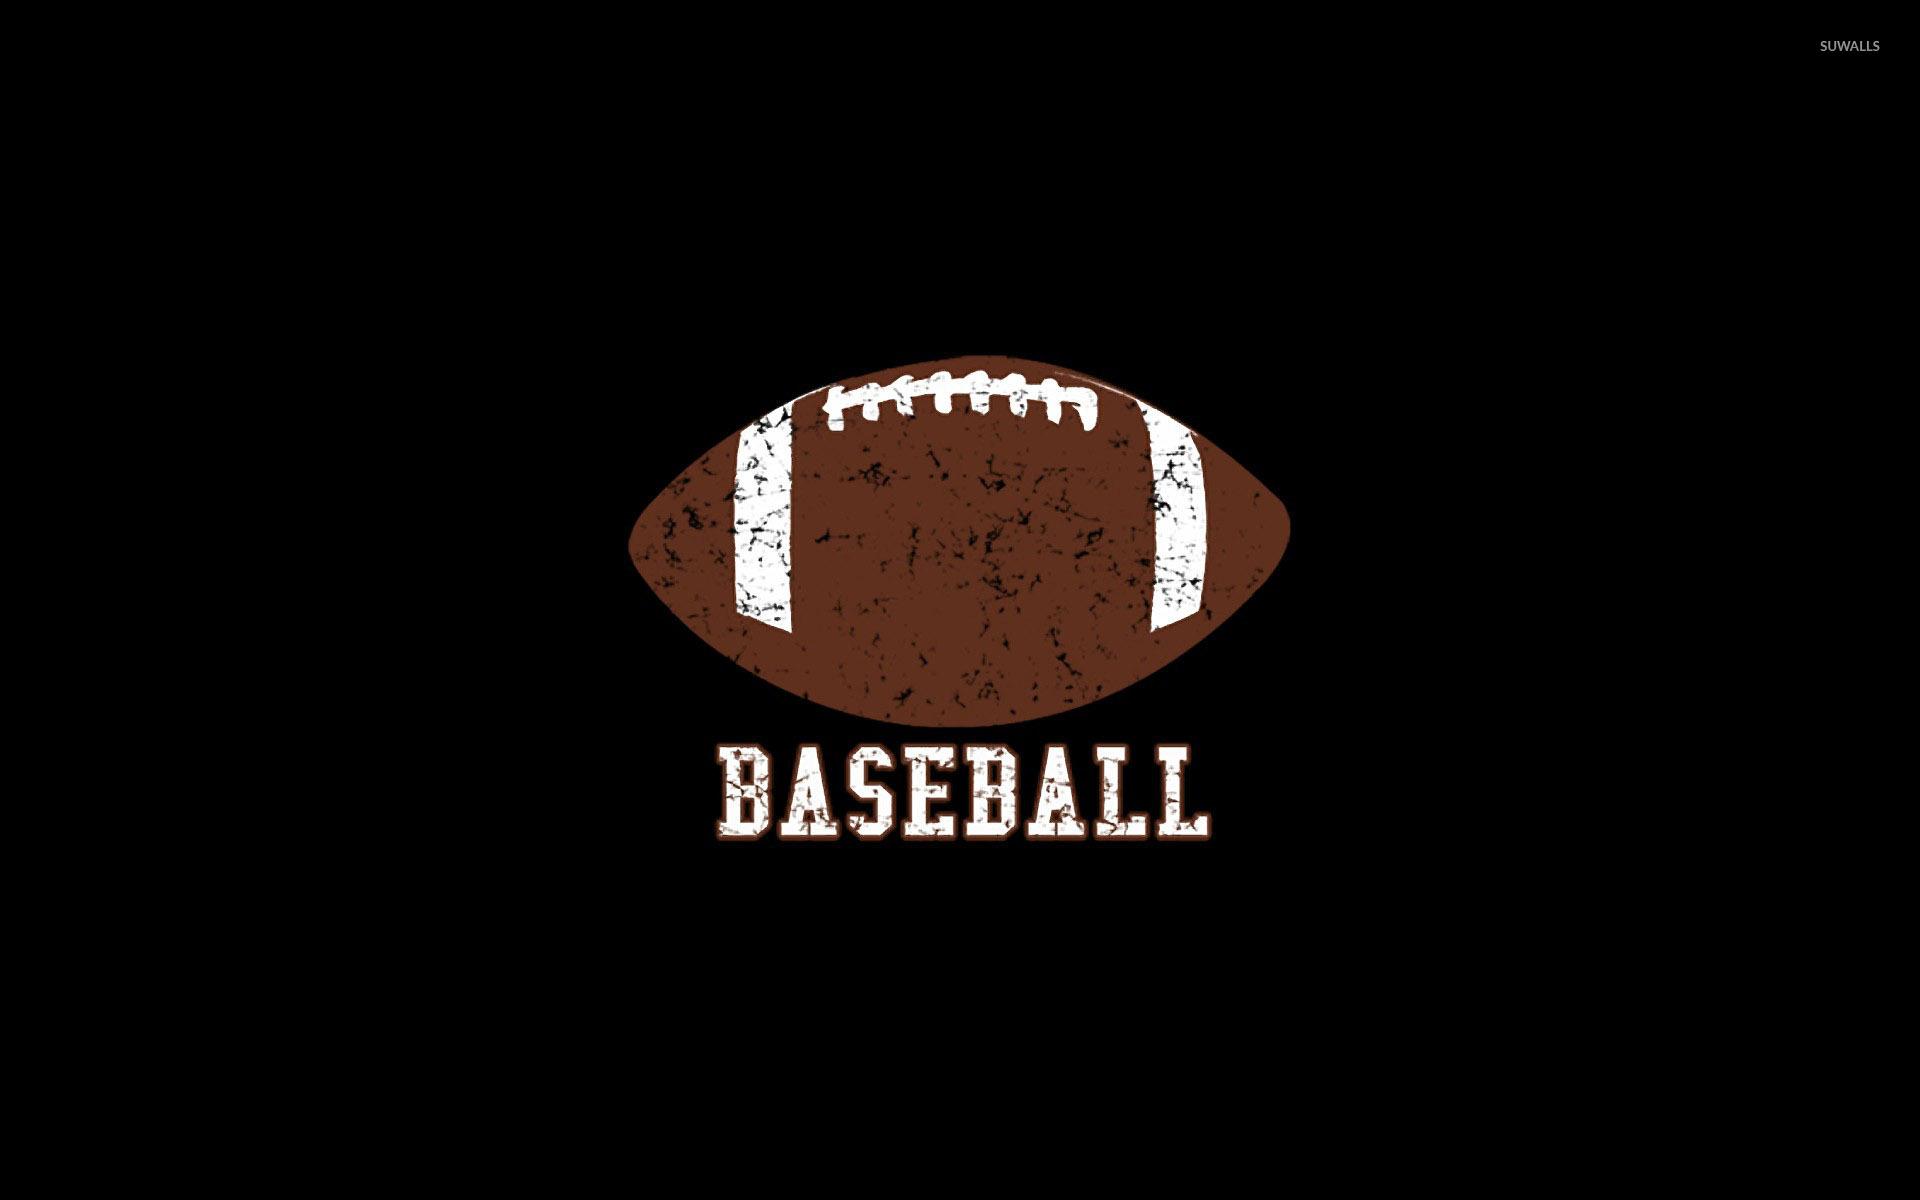 Baseball Wallpaper Sport Wallpapers 27432